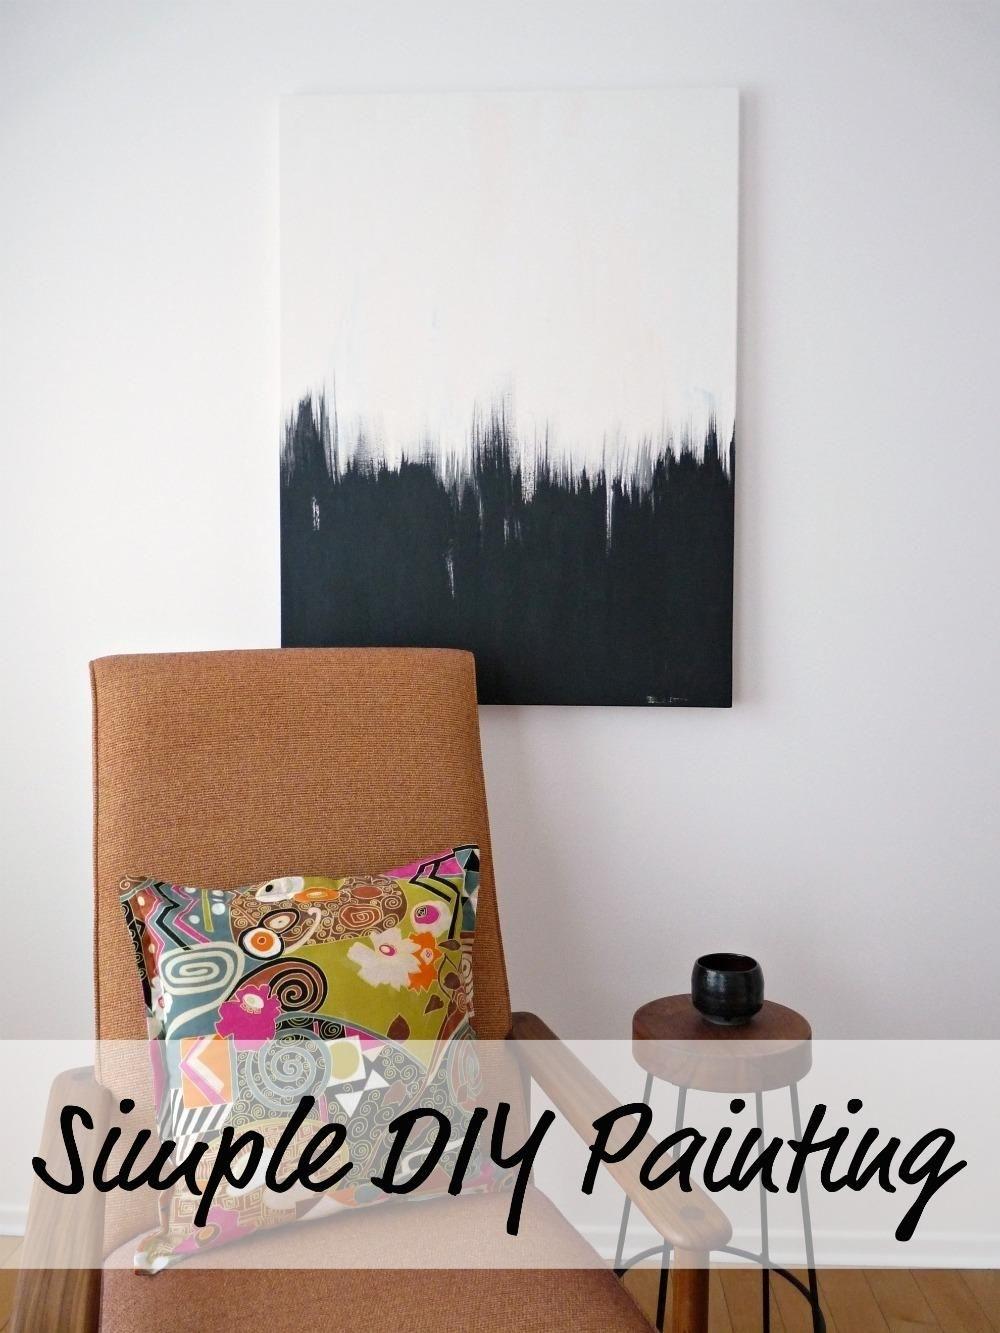 Diy Wall Art: Simple But Striking Diy Black And White Wall Art with Black And White Wall Art (Image 11 of 20)